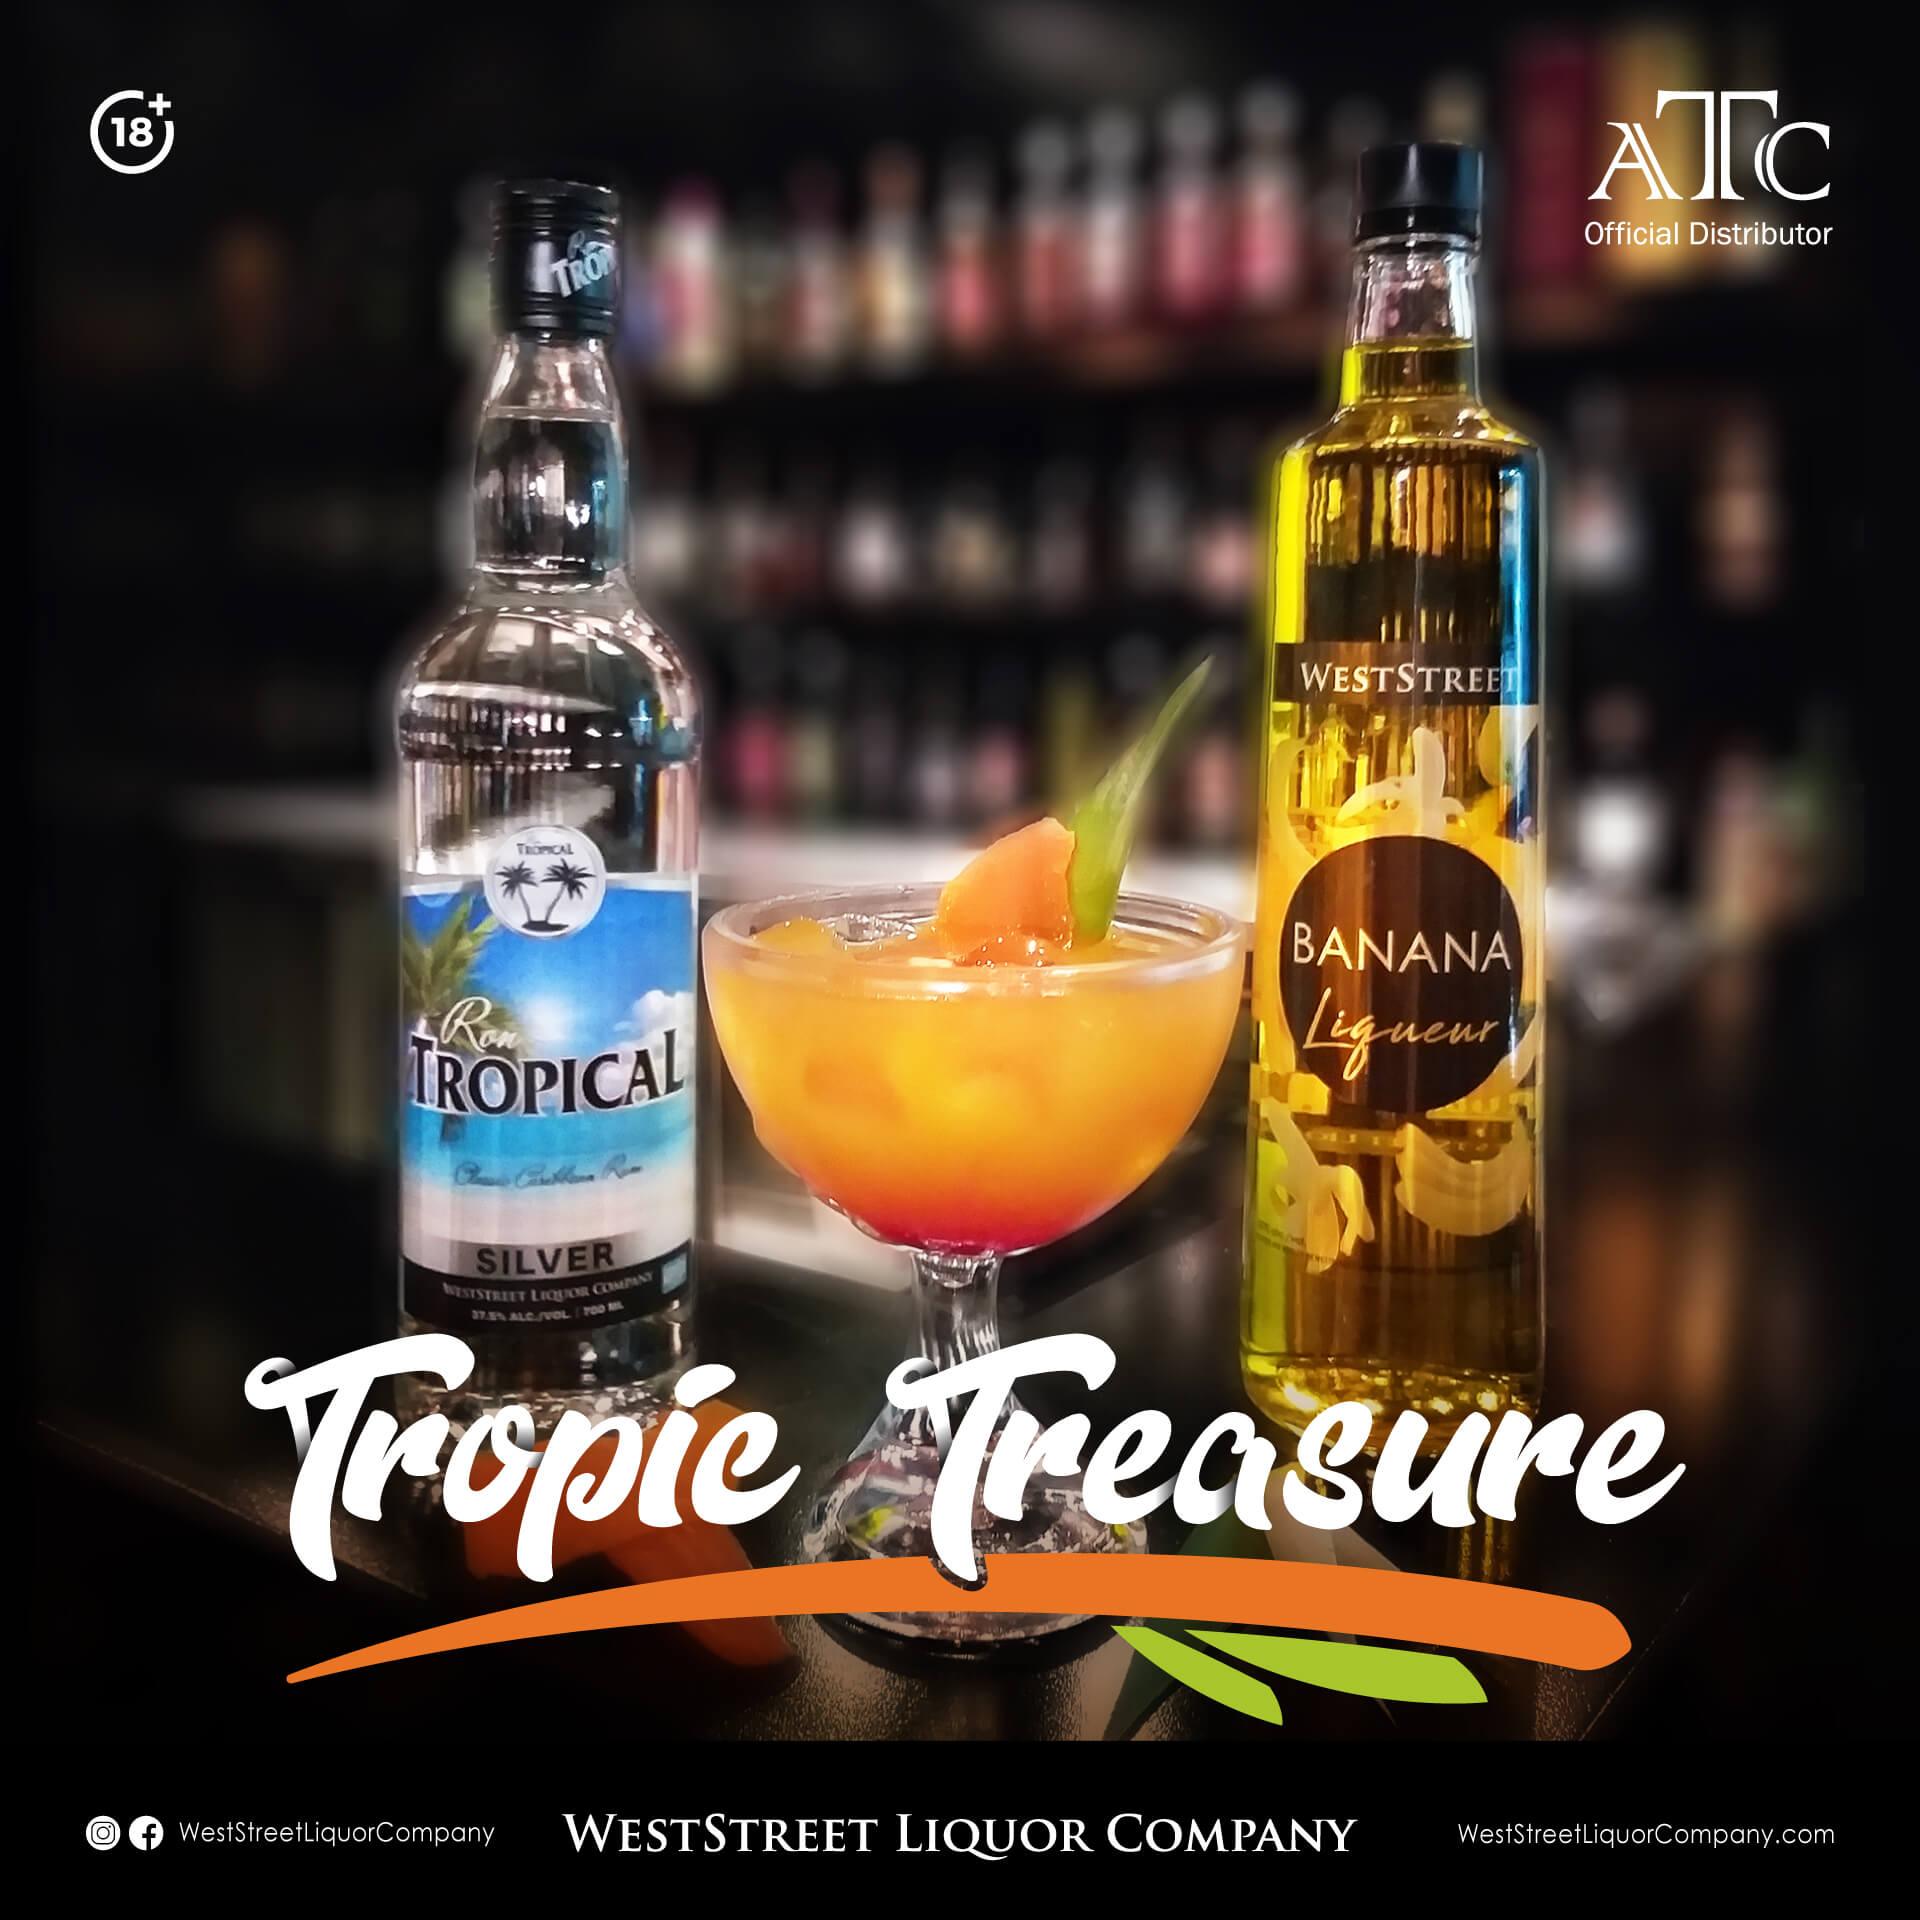 https://weststreetliquorcompany.com/wp-content/uploads/2021/07/21074BTL-Tropic-Treasure-1920x1920px-1.jpg